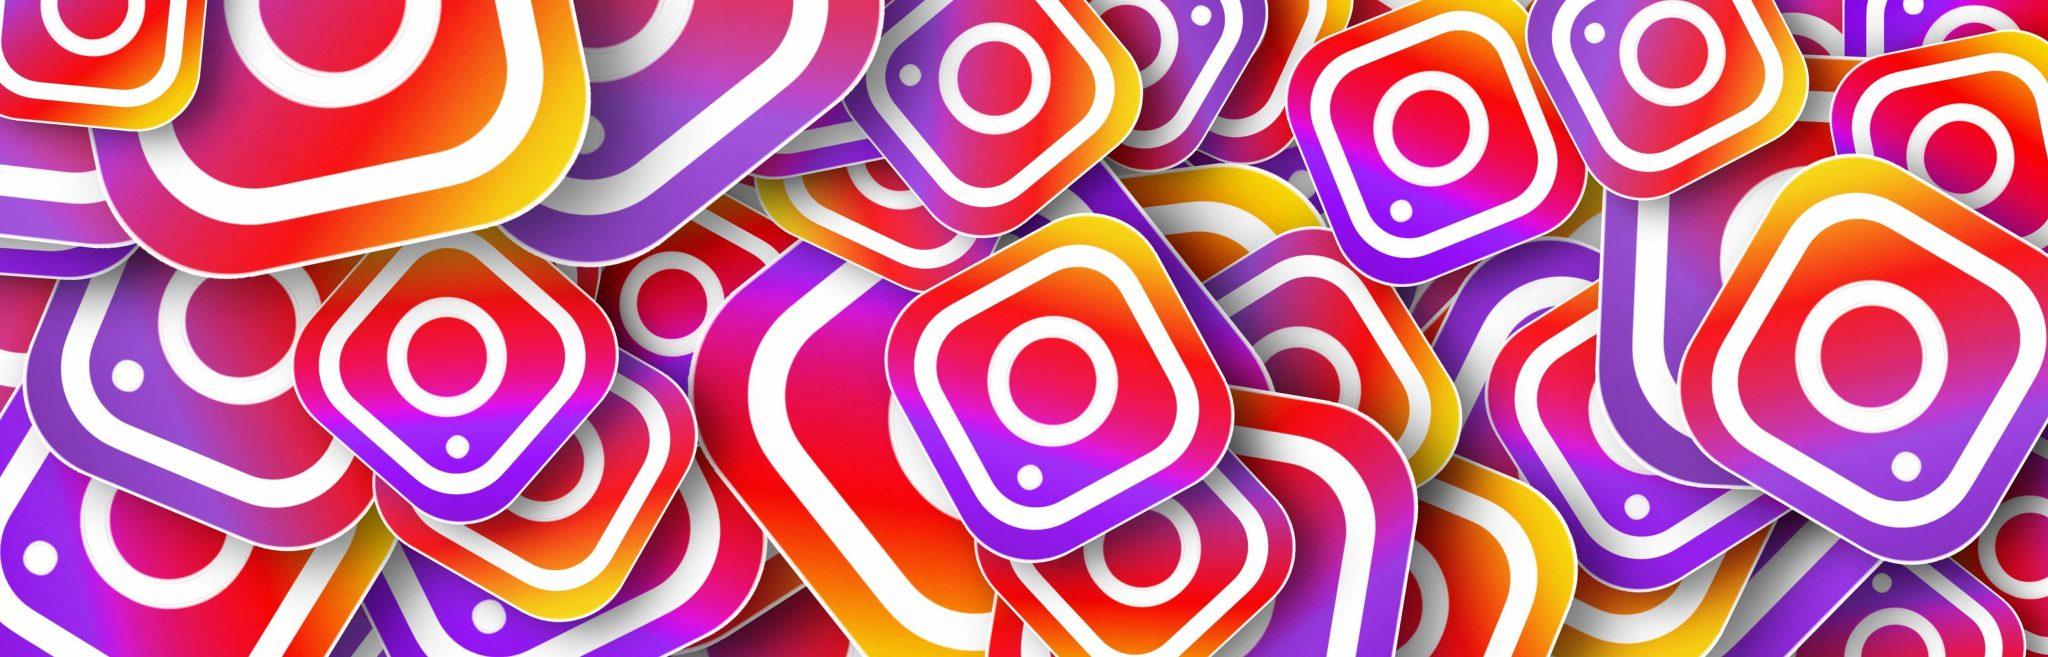 best Instagram marketing practices